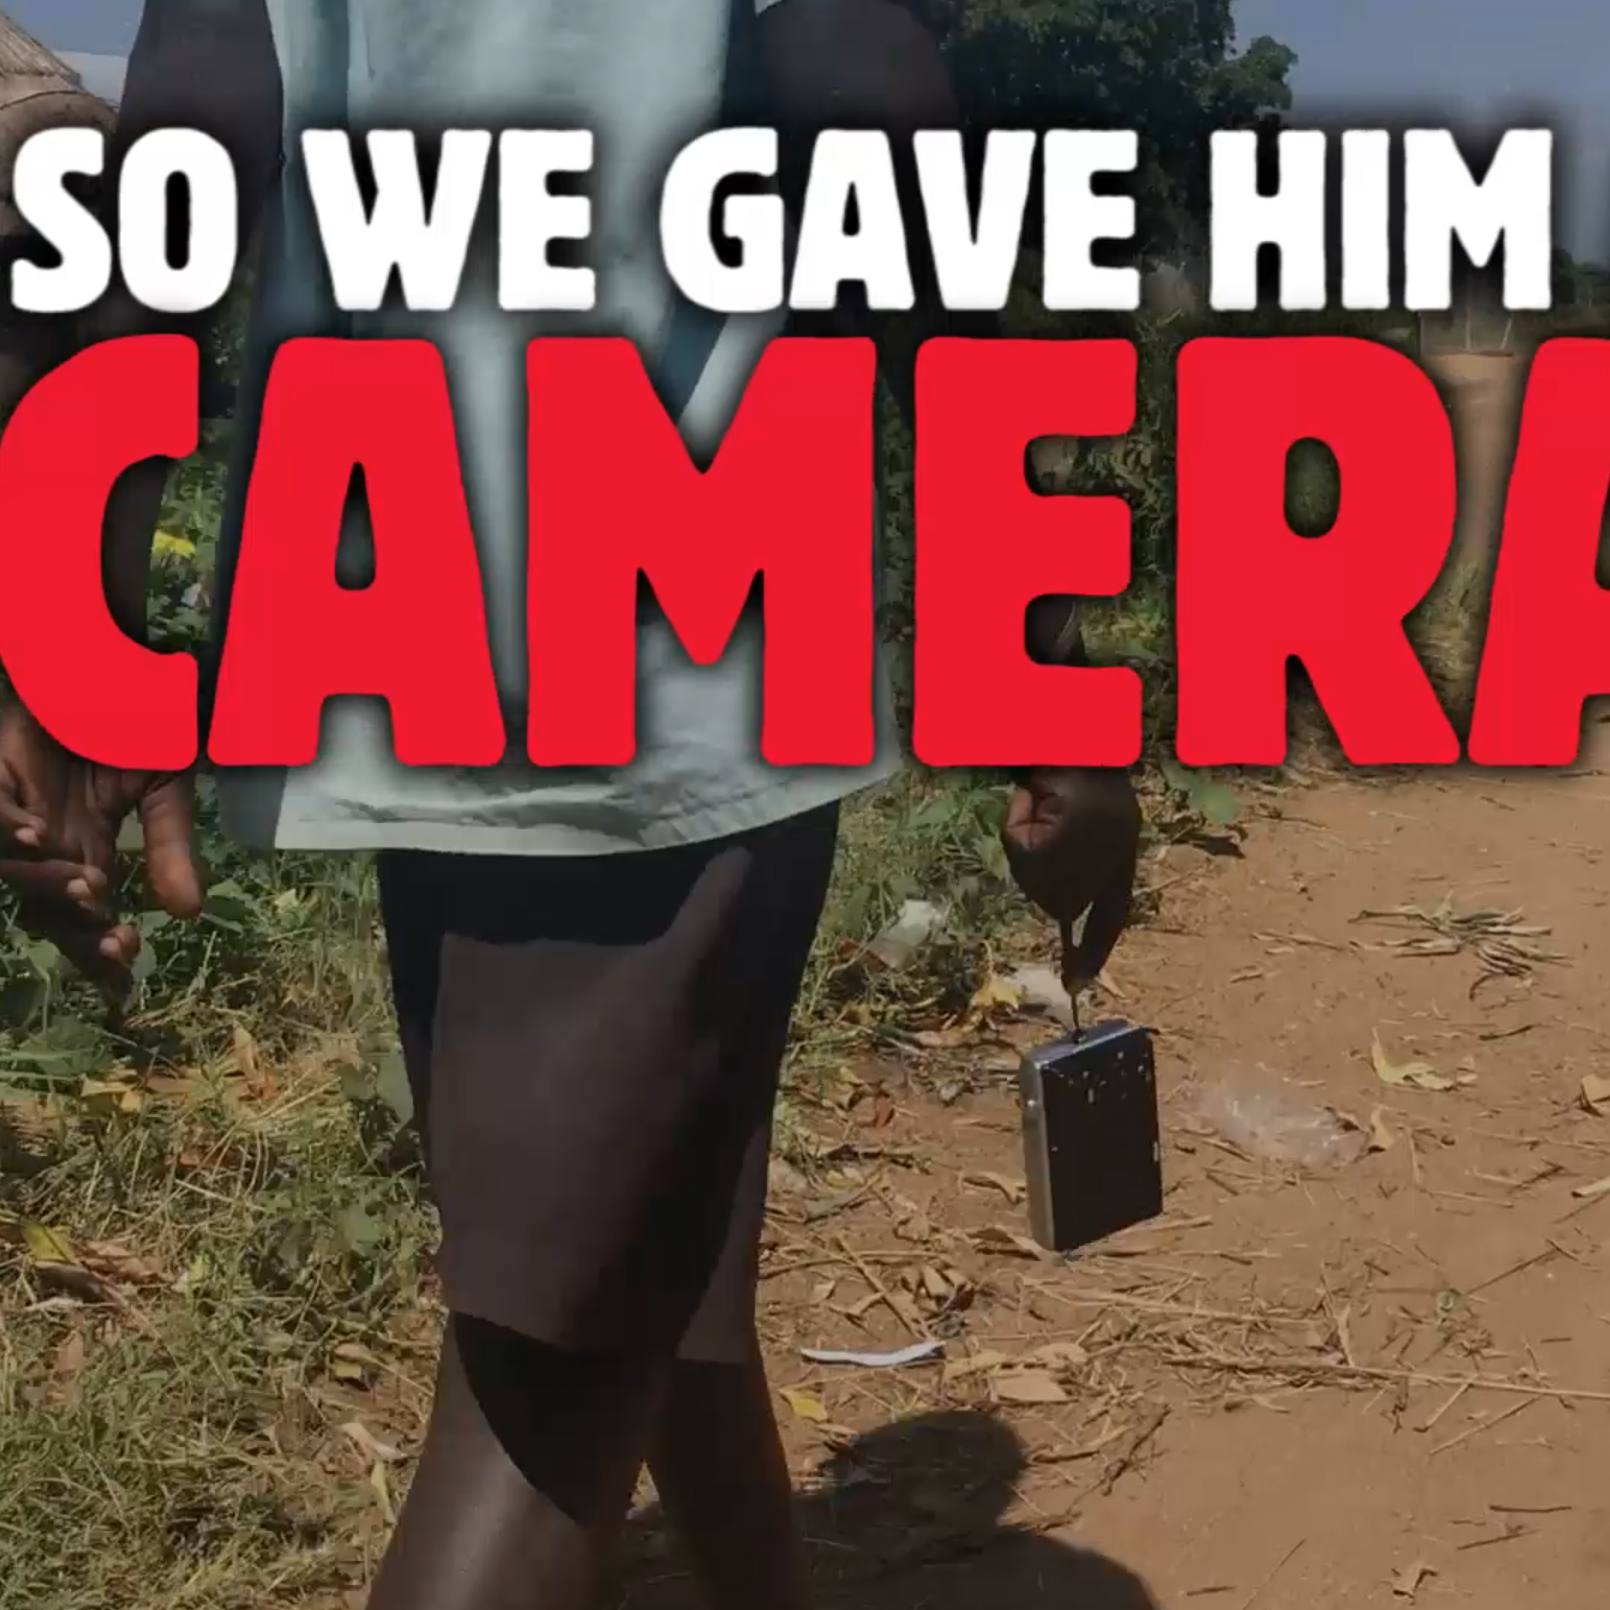 VIDEO - Steven's journey to a new future in Uganda